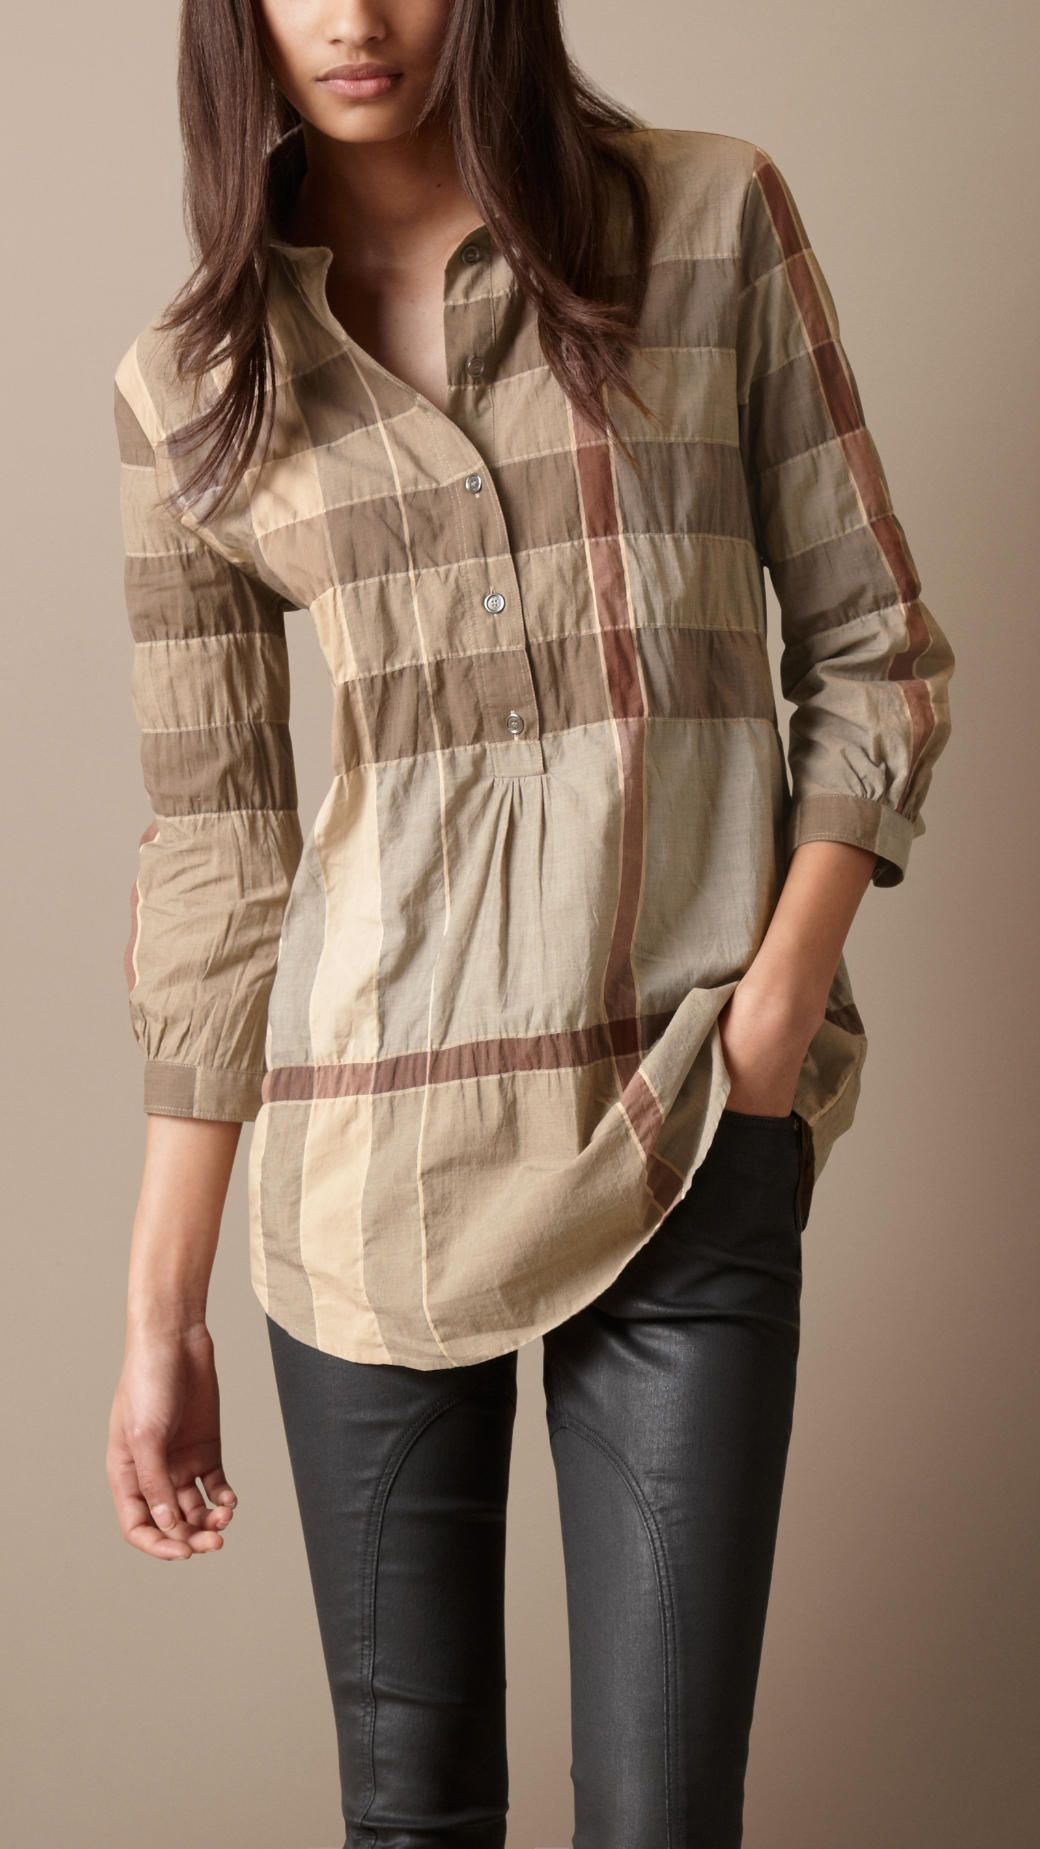 3d62e34b80e #Burberry Brit light military khaki cotton blend tunic (LOVE this print and  love the style) Tunics #2dayslook #Tunics style #TunicsfashionTunics ...